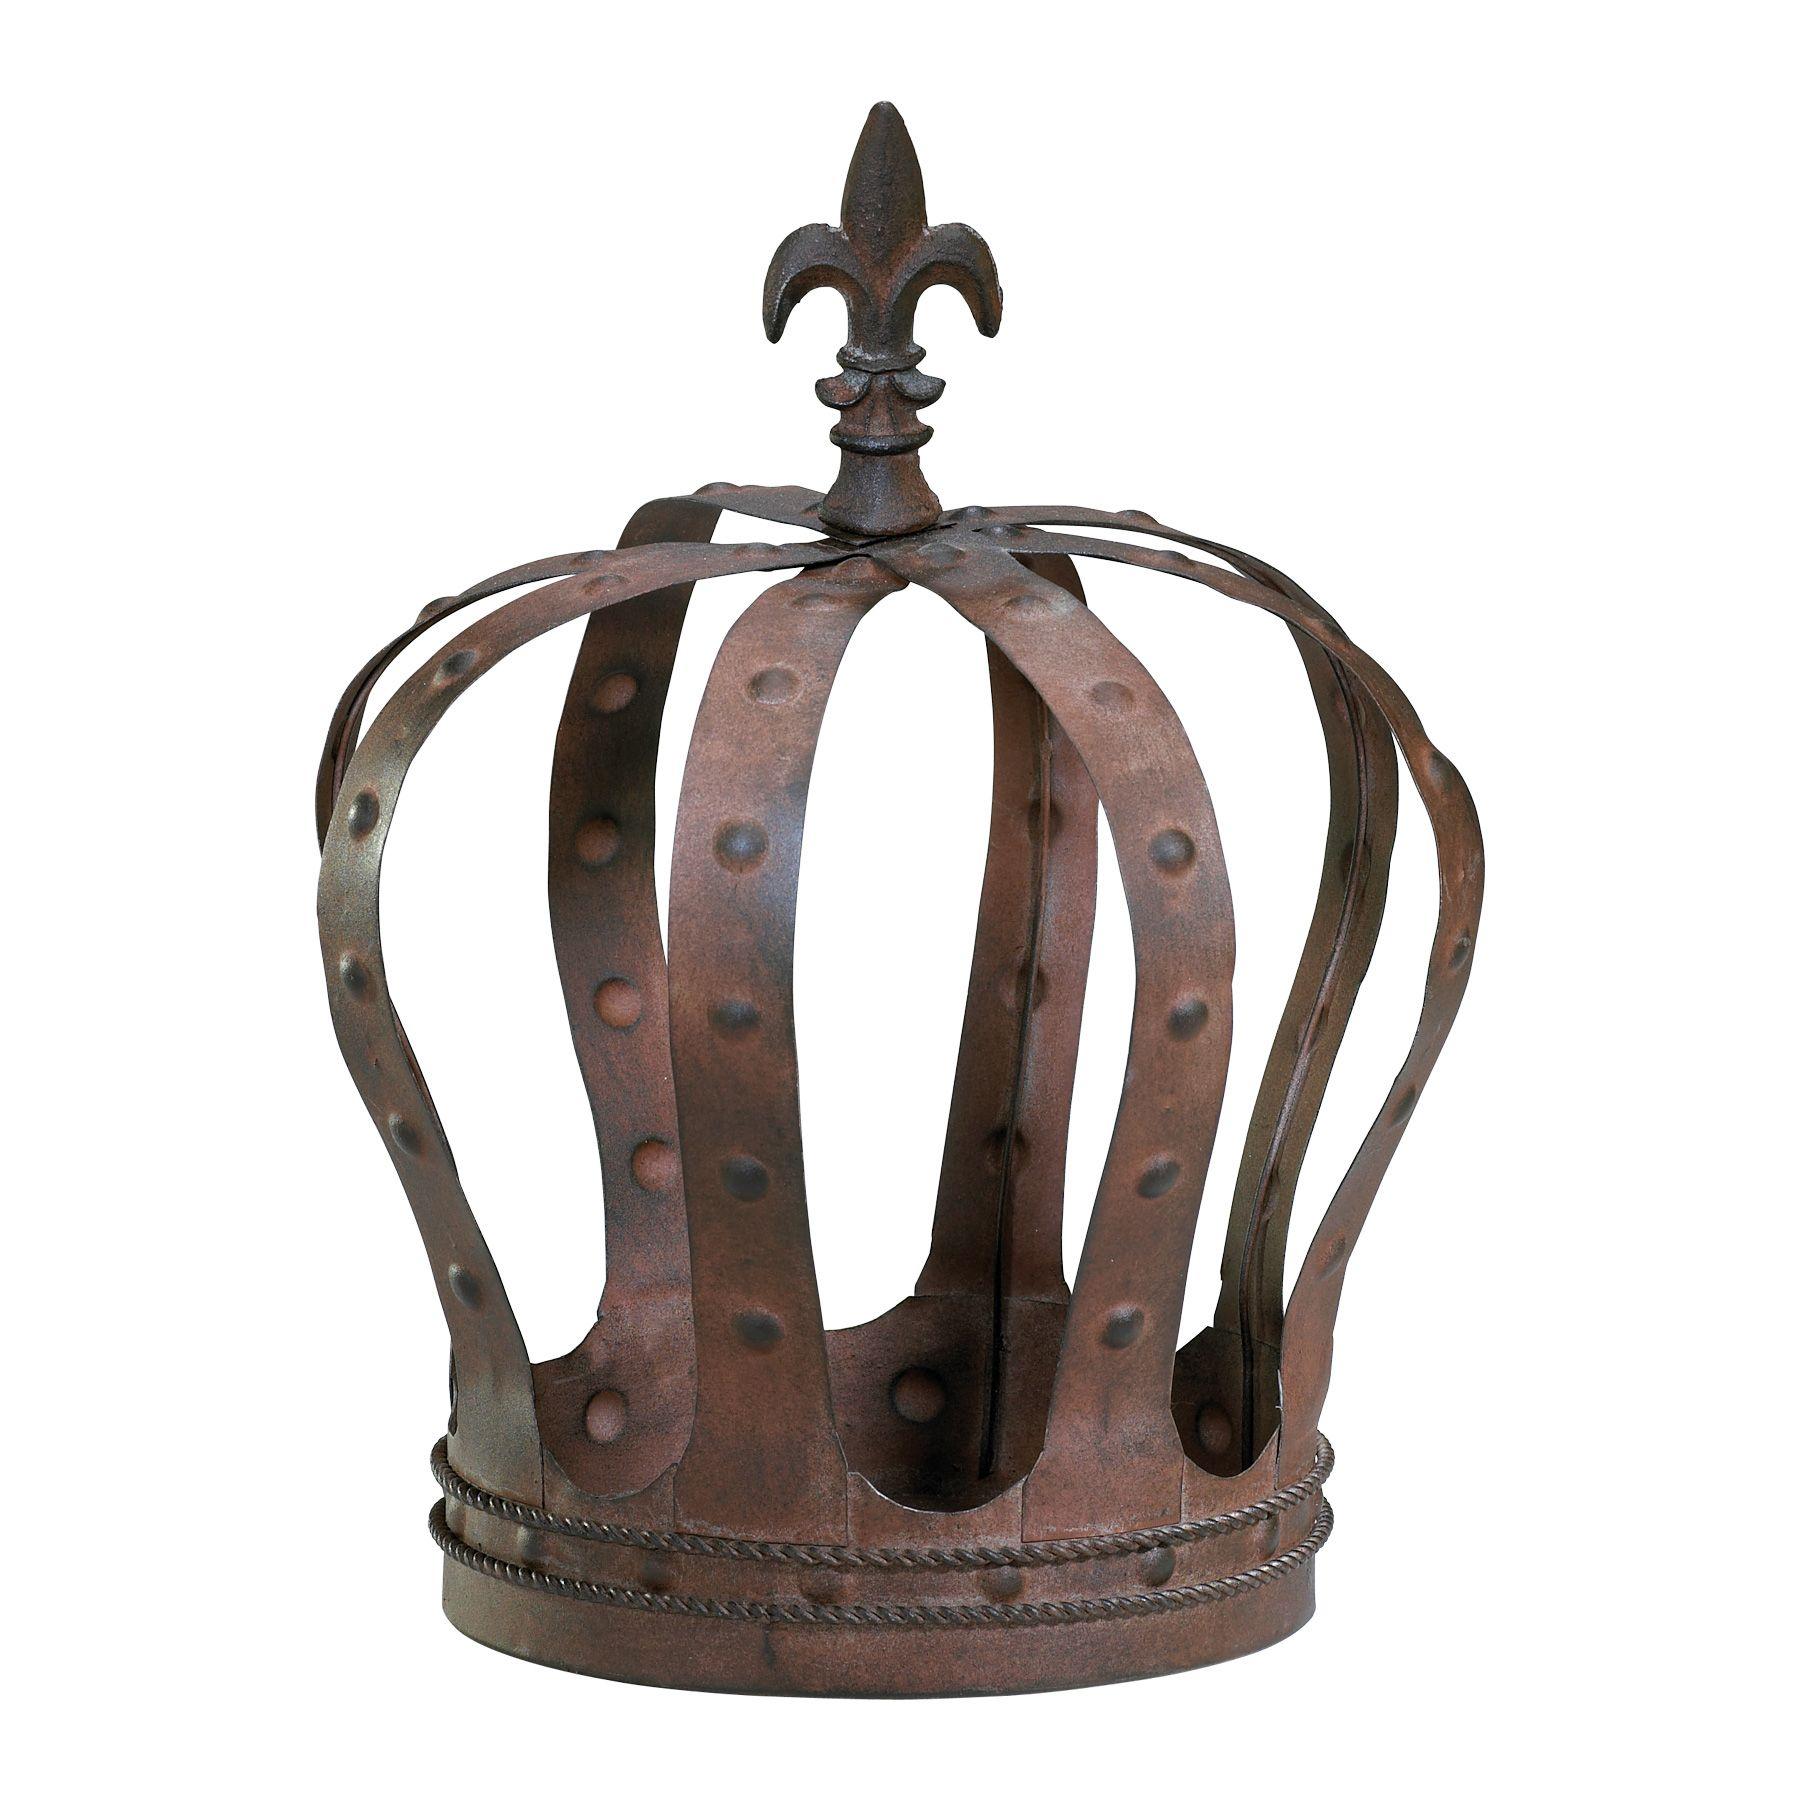 Pin by ✿ Susie ✿ on Home Genius   Crown decor, Metal crown ...